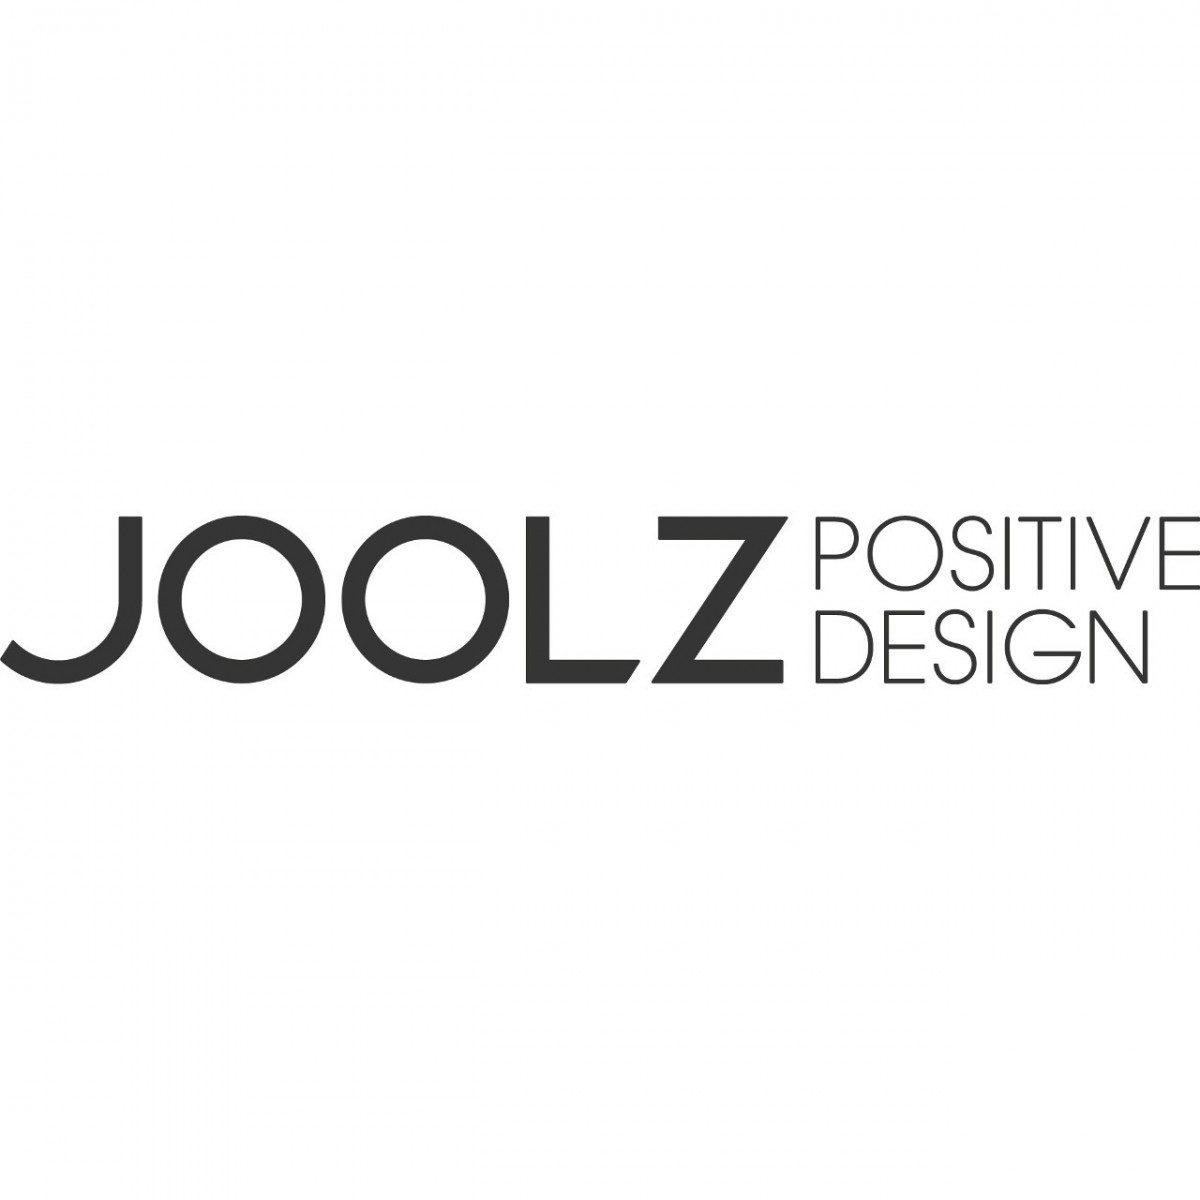 Joolz, Positive Design